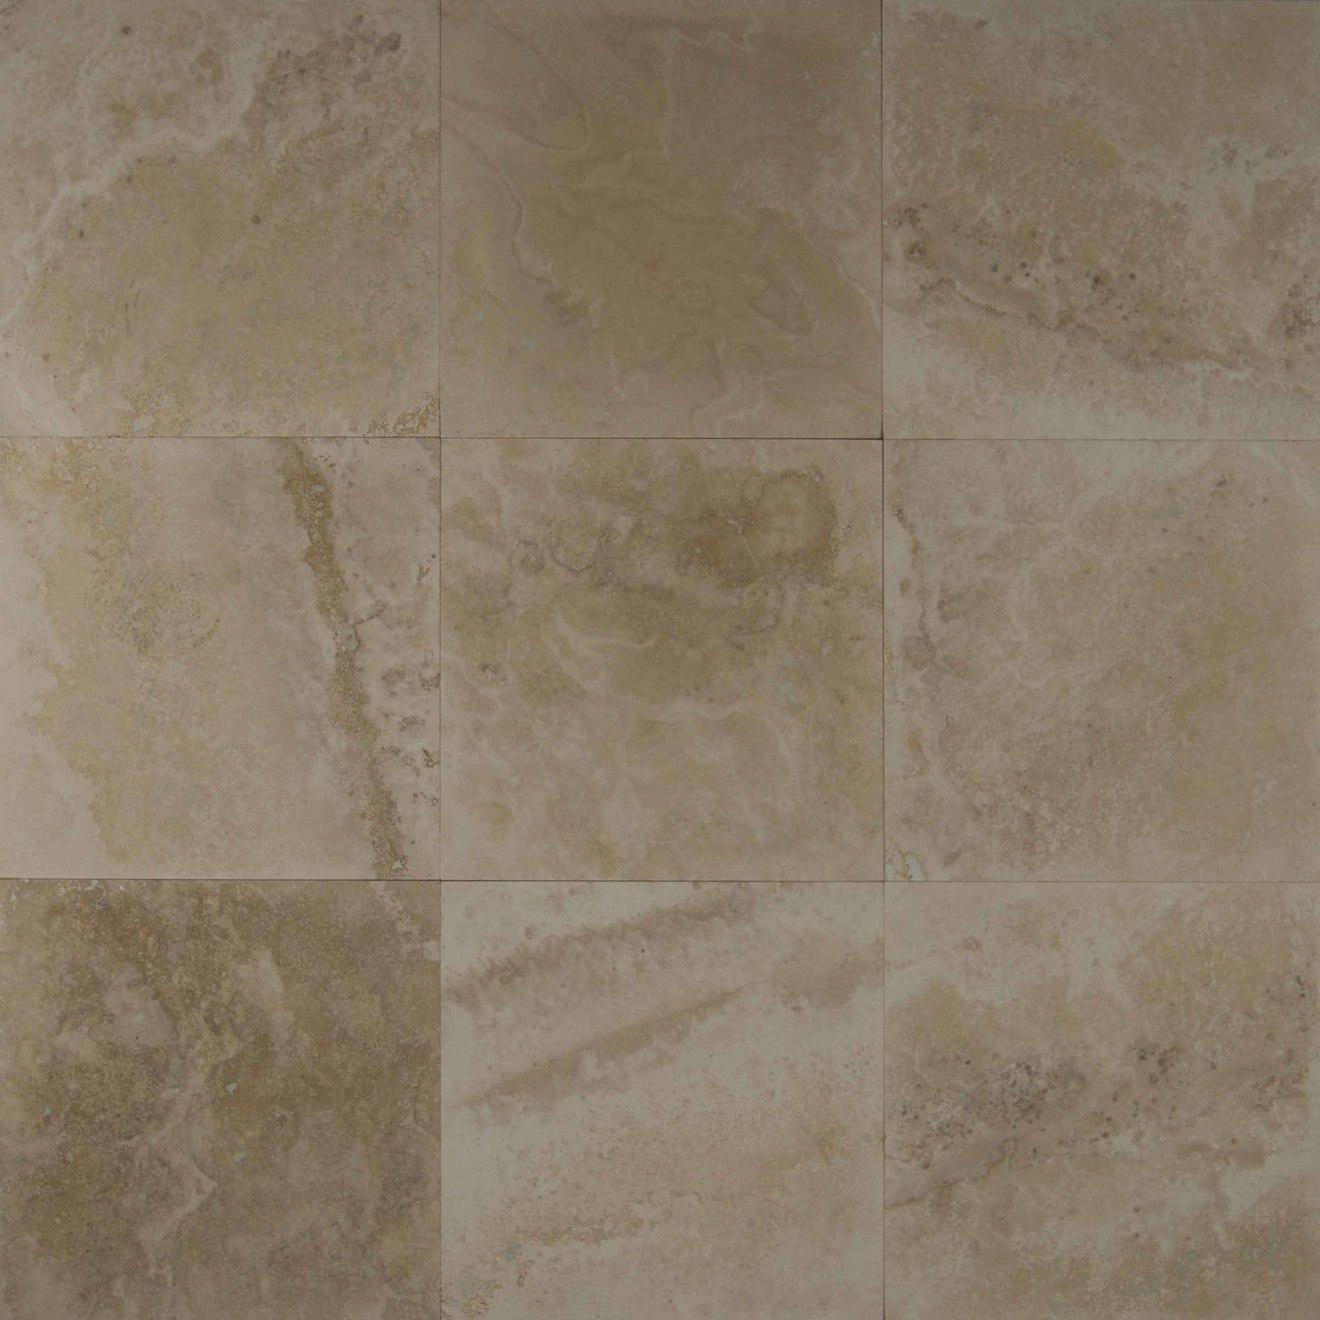 Saturina X BrushedStraigh - 16x16 tiles square feet